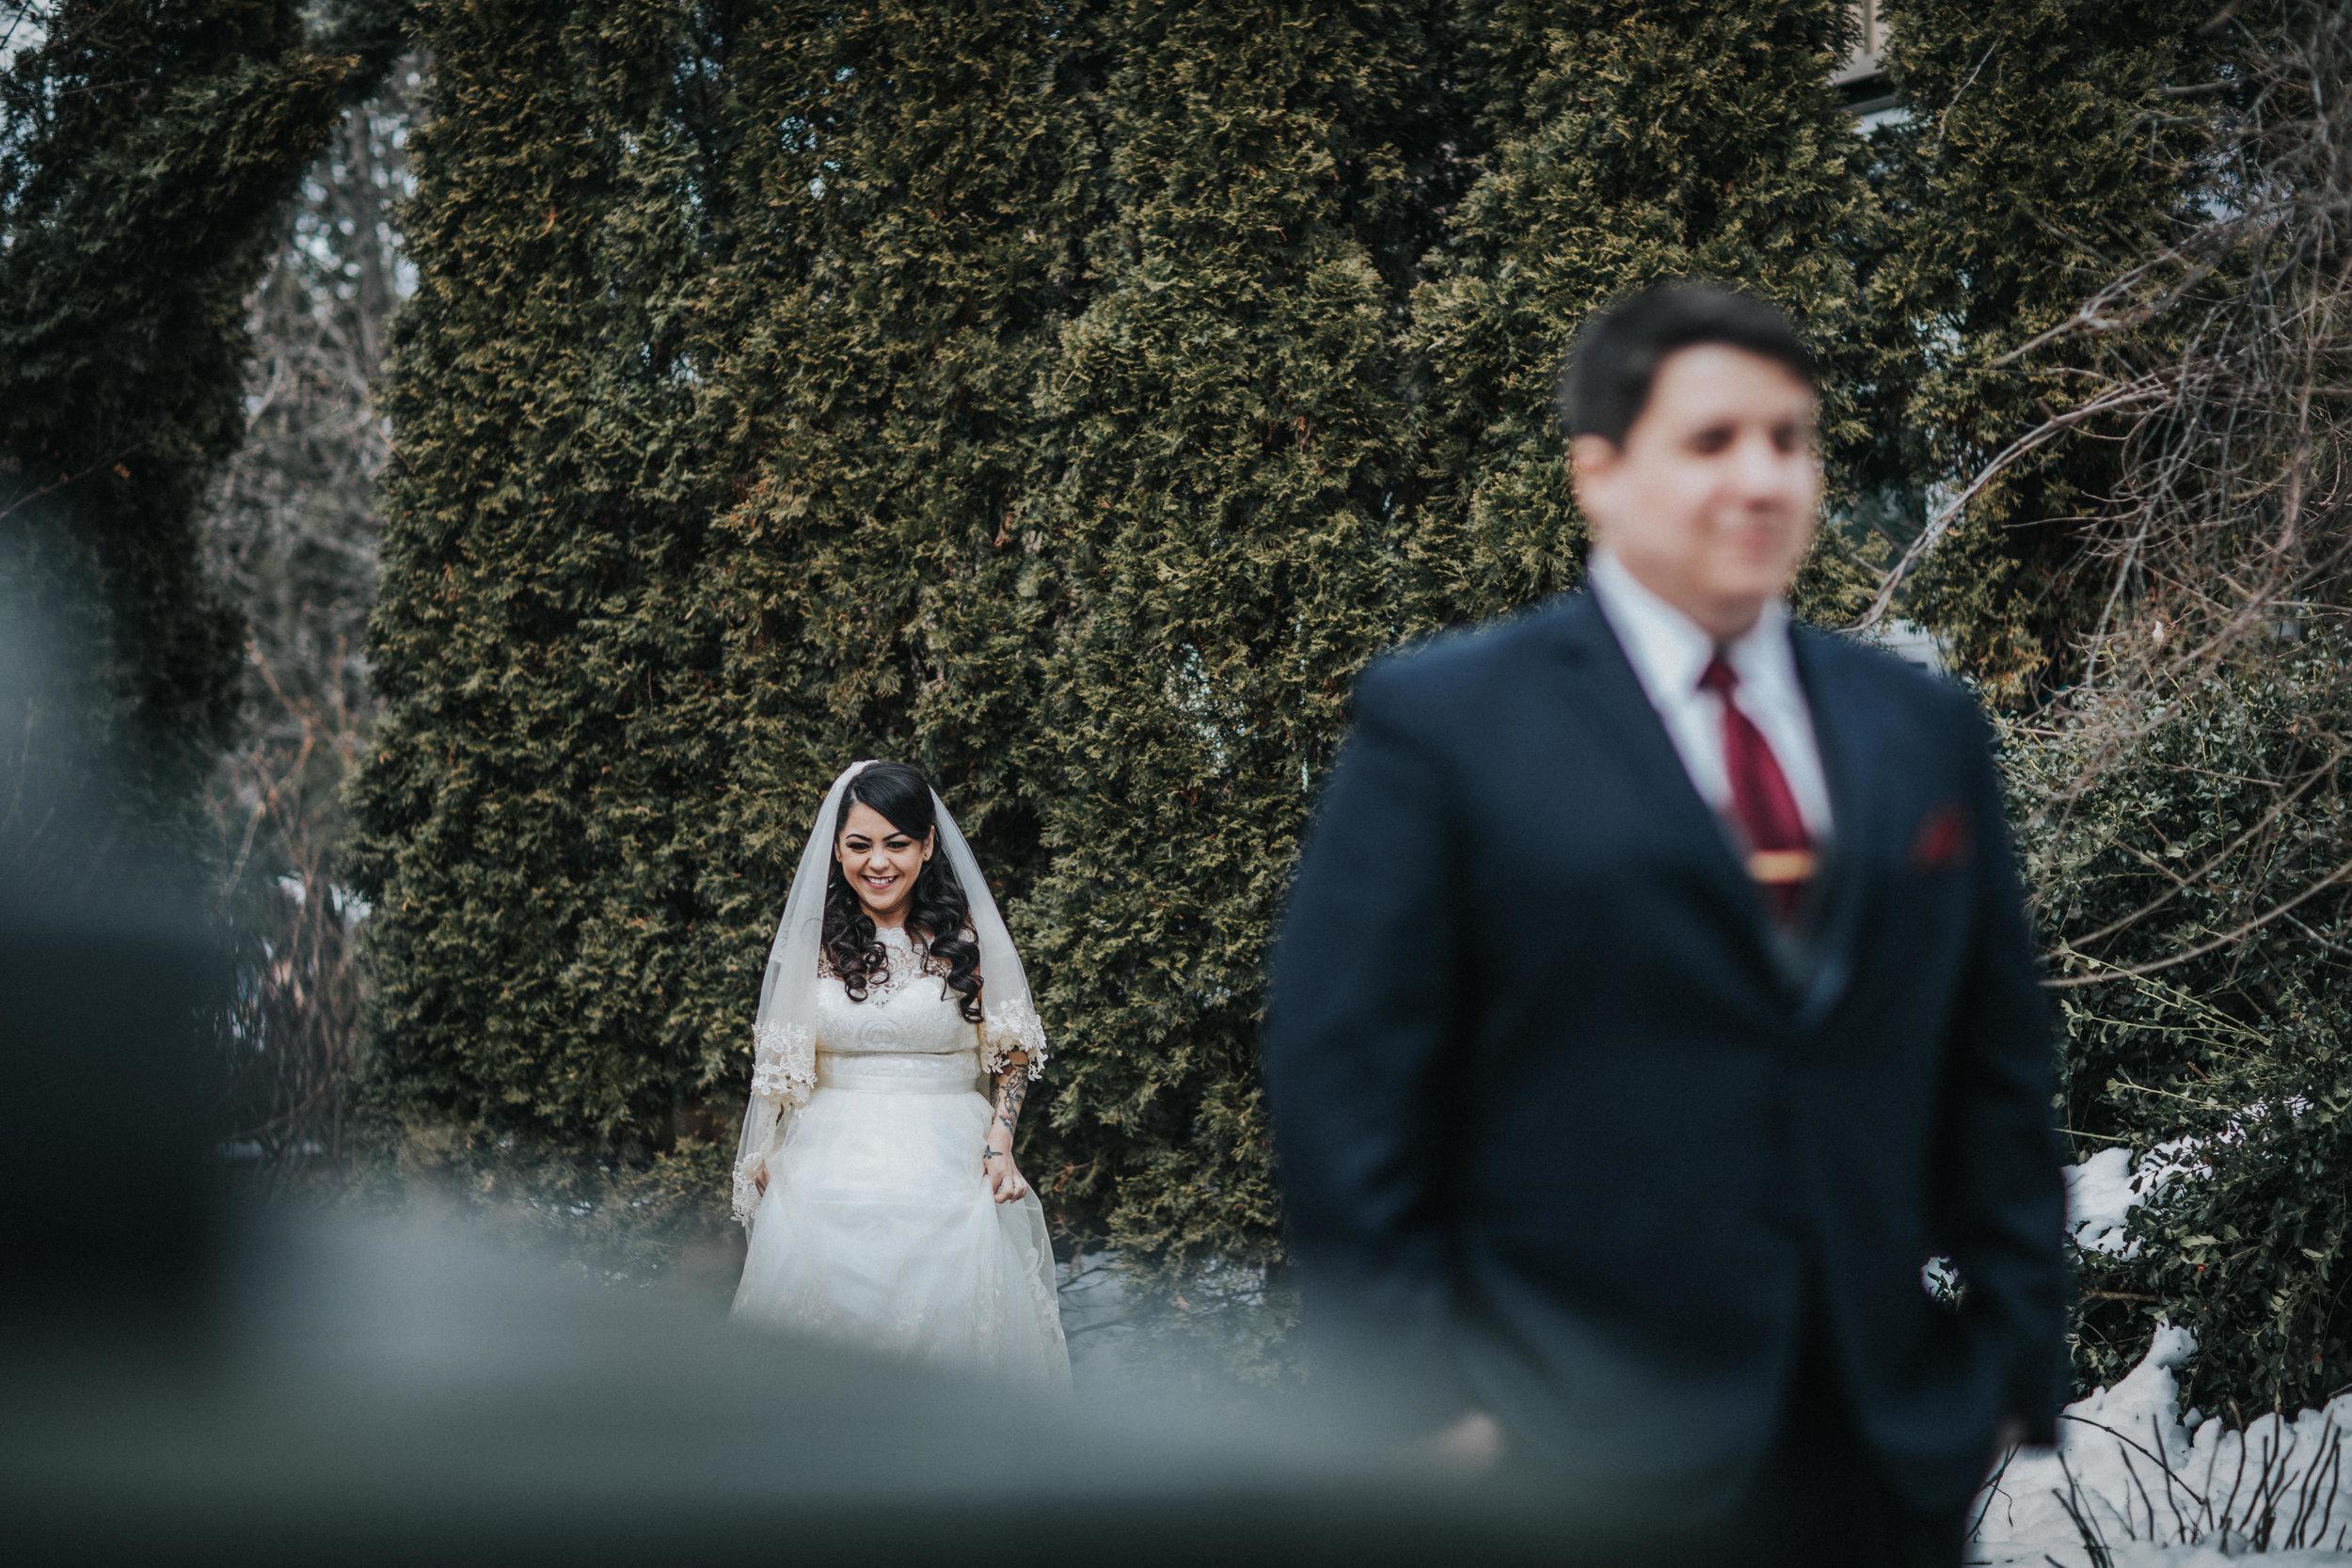 New-Jersey-Wedding-Photographer-ReceptionCenter-Valeria&Mike-First-Look-Bride&Groom (49 of 69).jpg